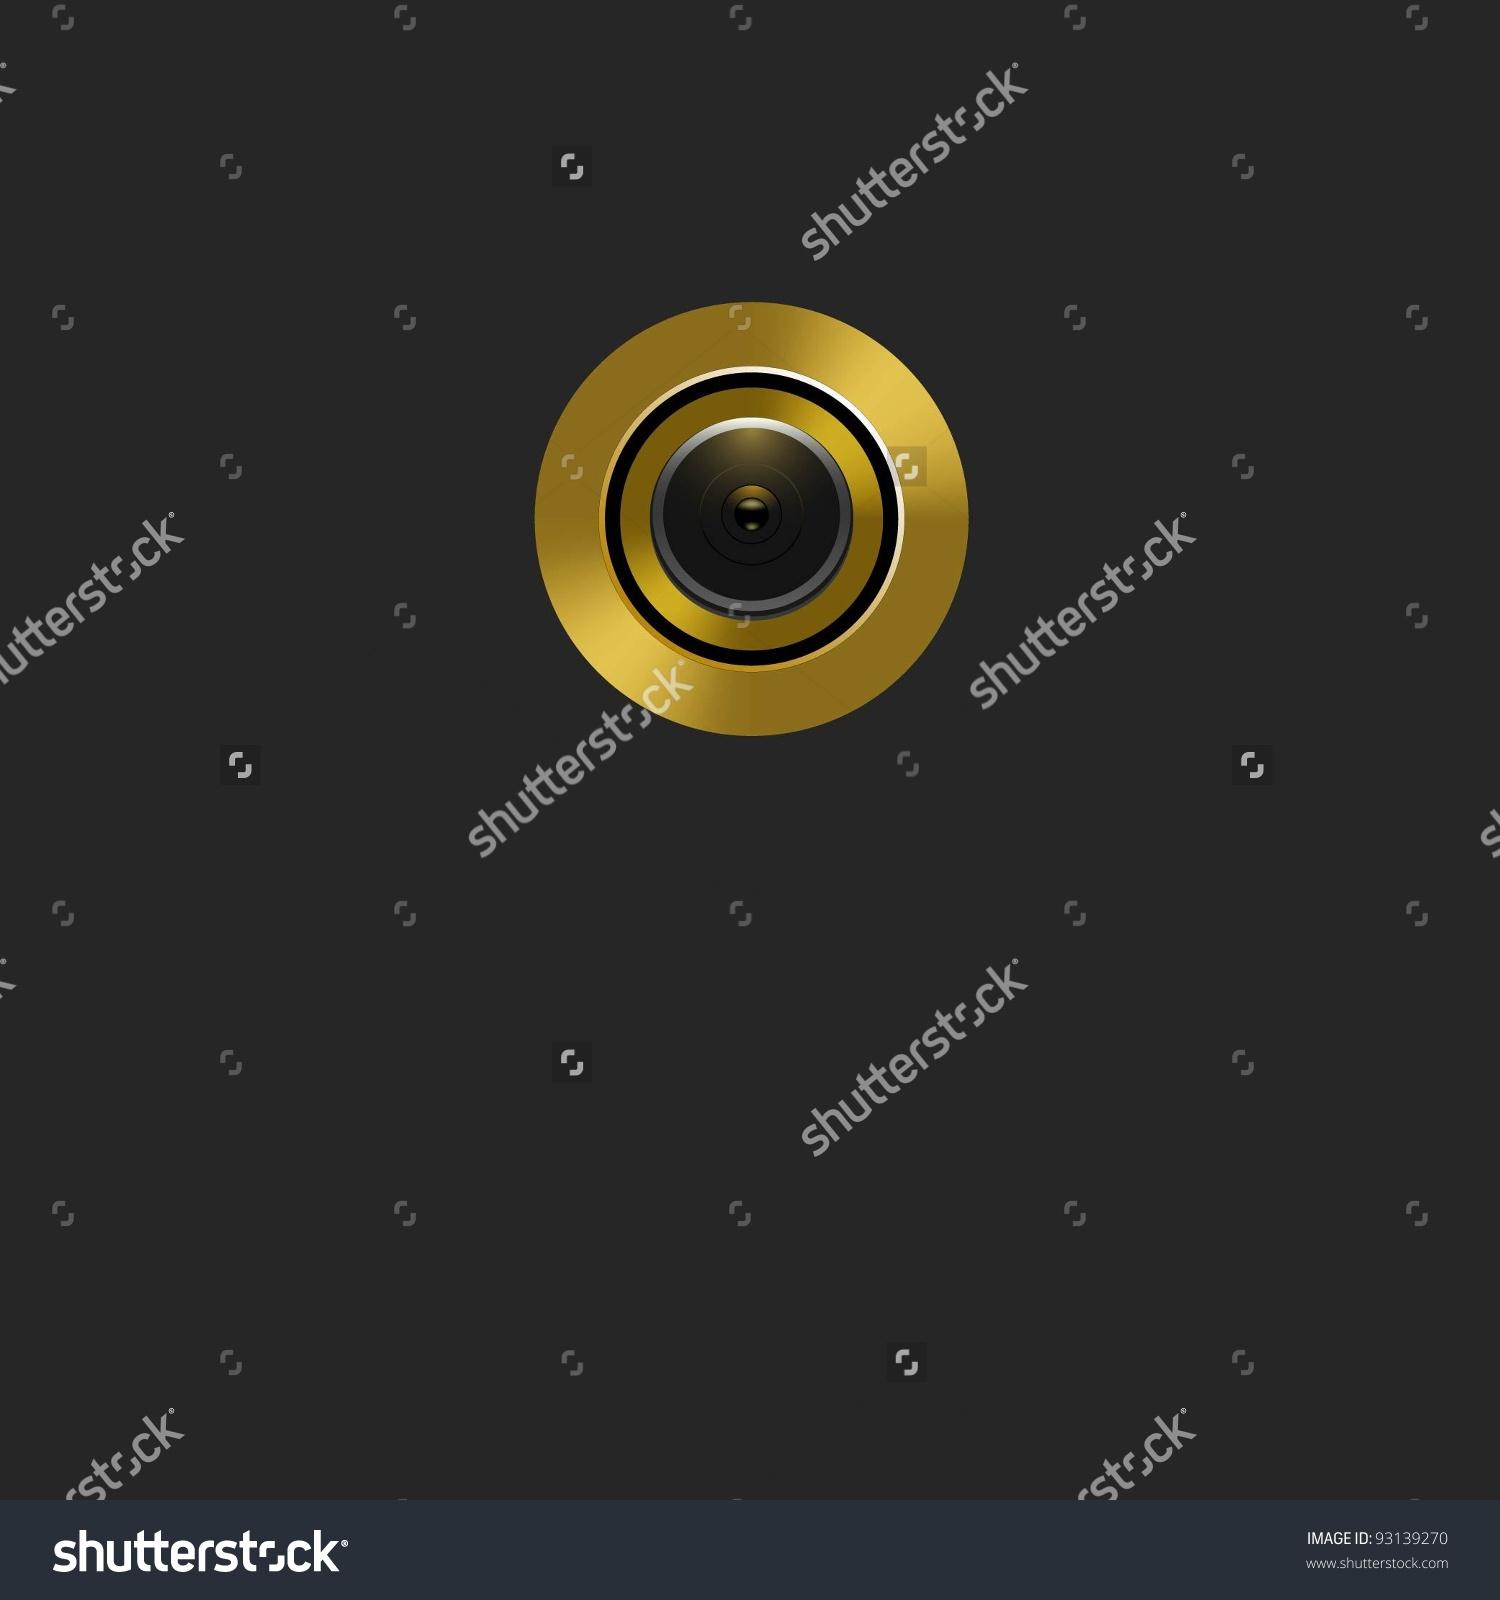 Door Lens Peephole Stock Vector Illustration 93139270 : Shutterstock.